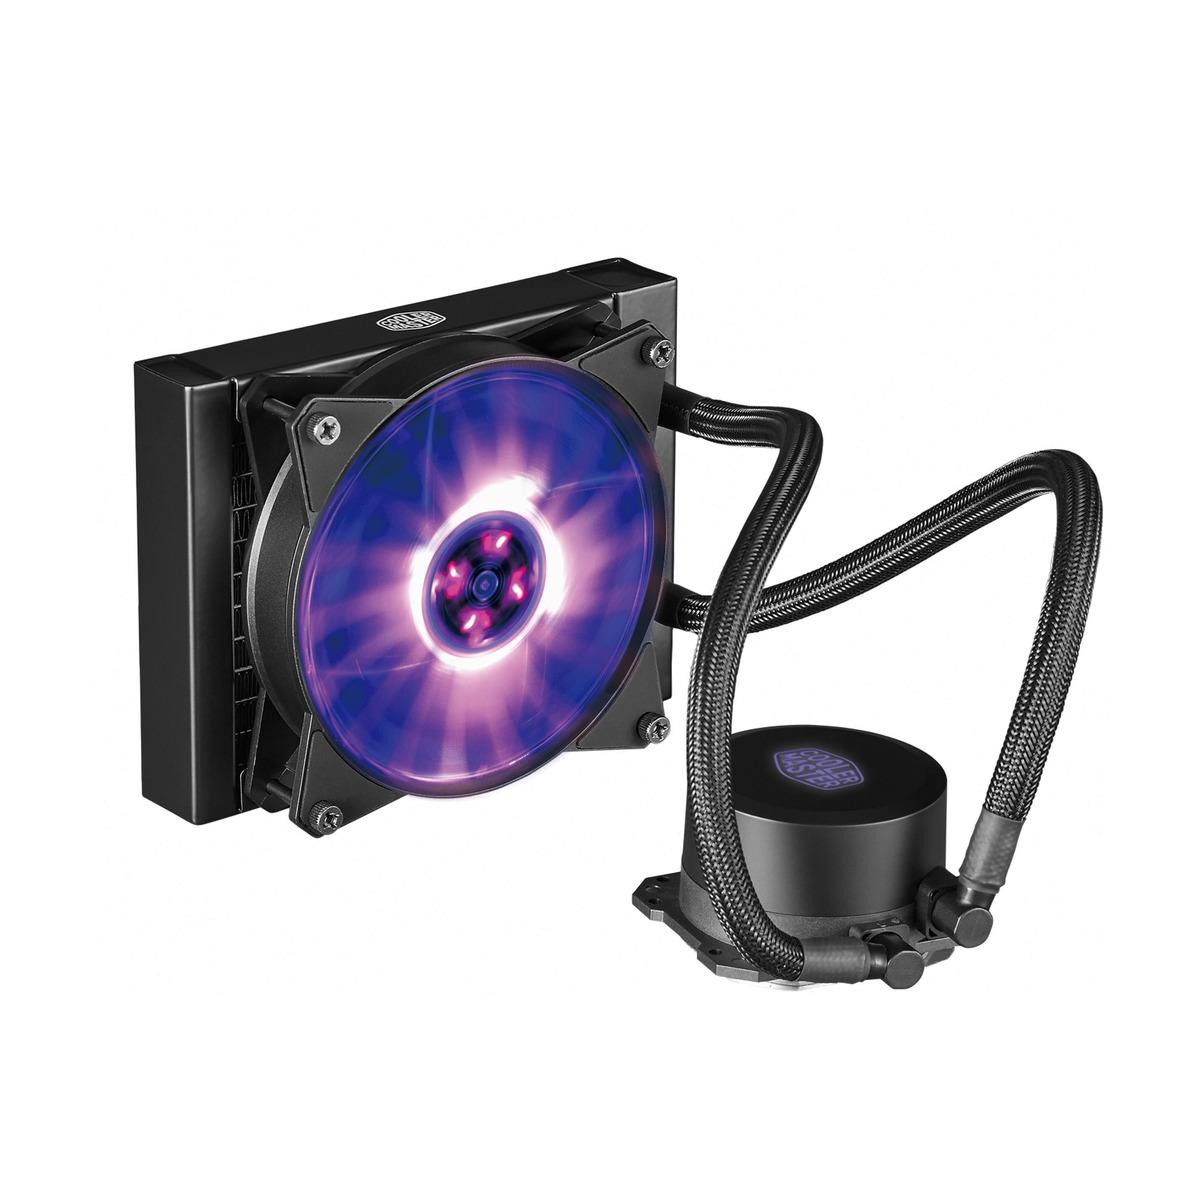 Cooler Master MasterLiquid ML120L RGB vannkjøling